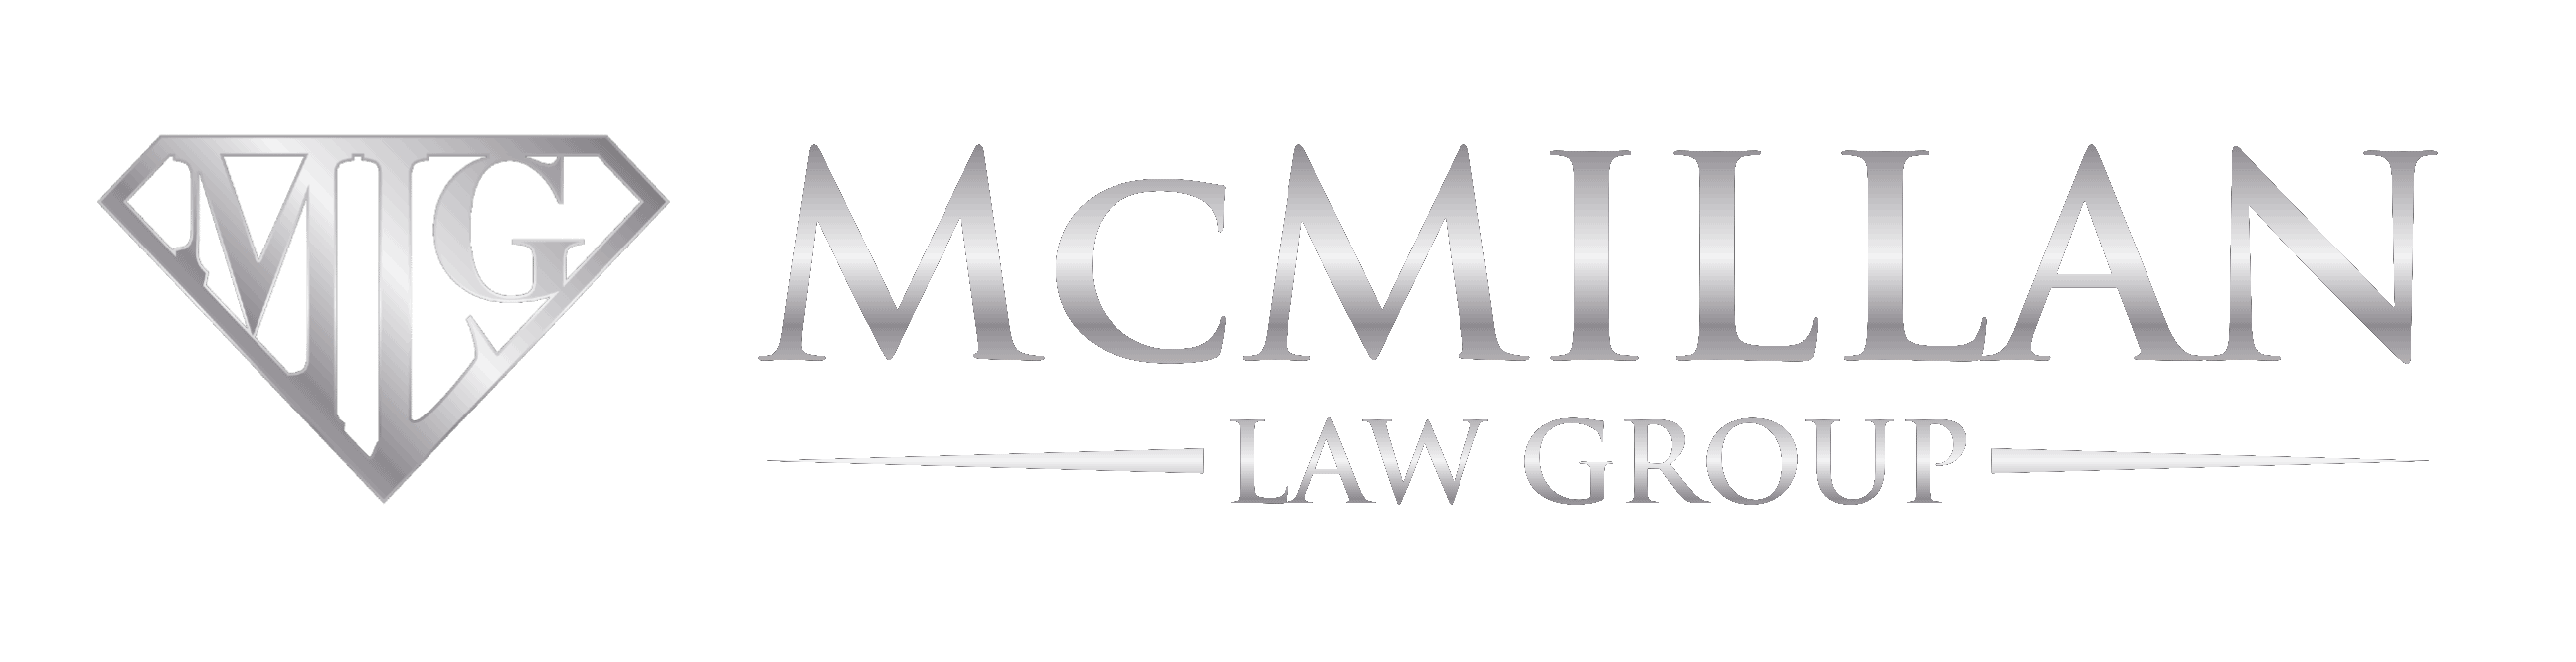 McMillan Law Group